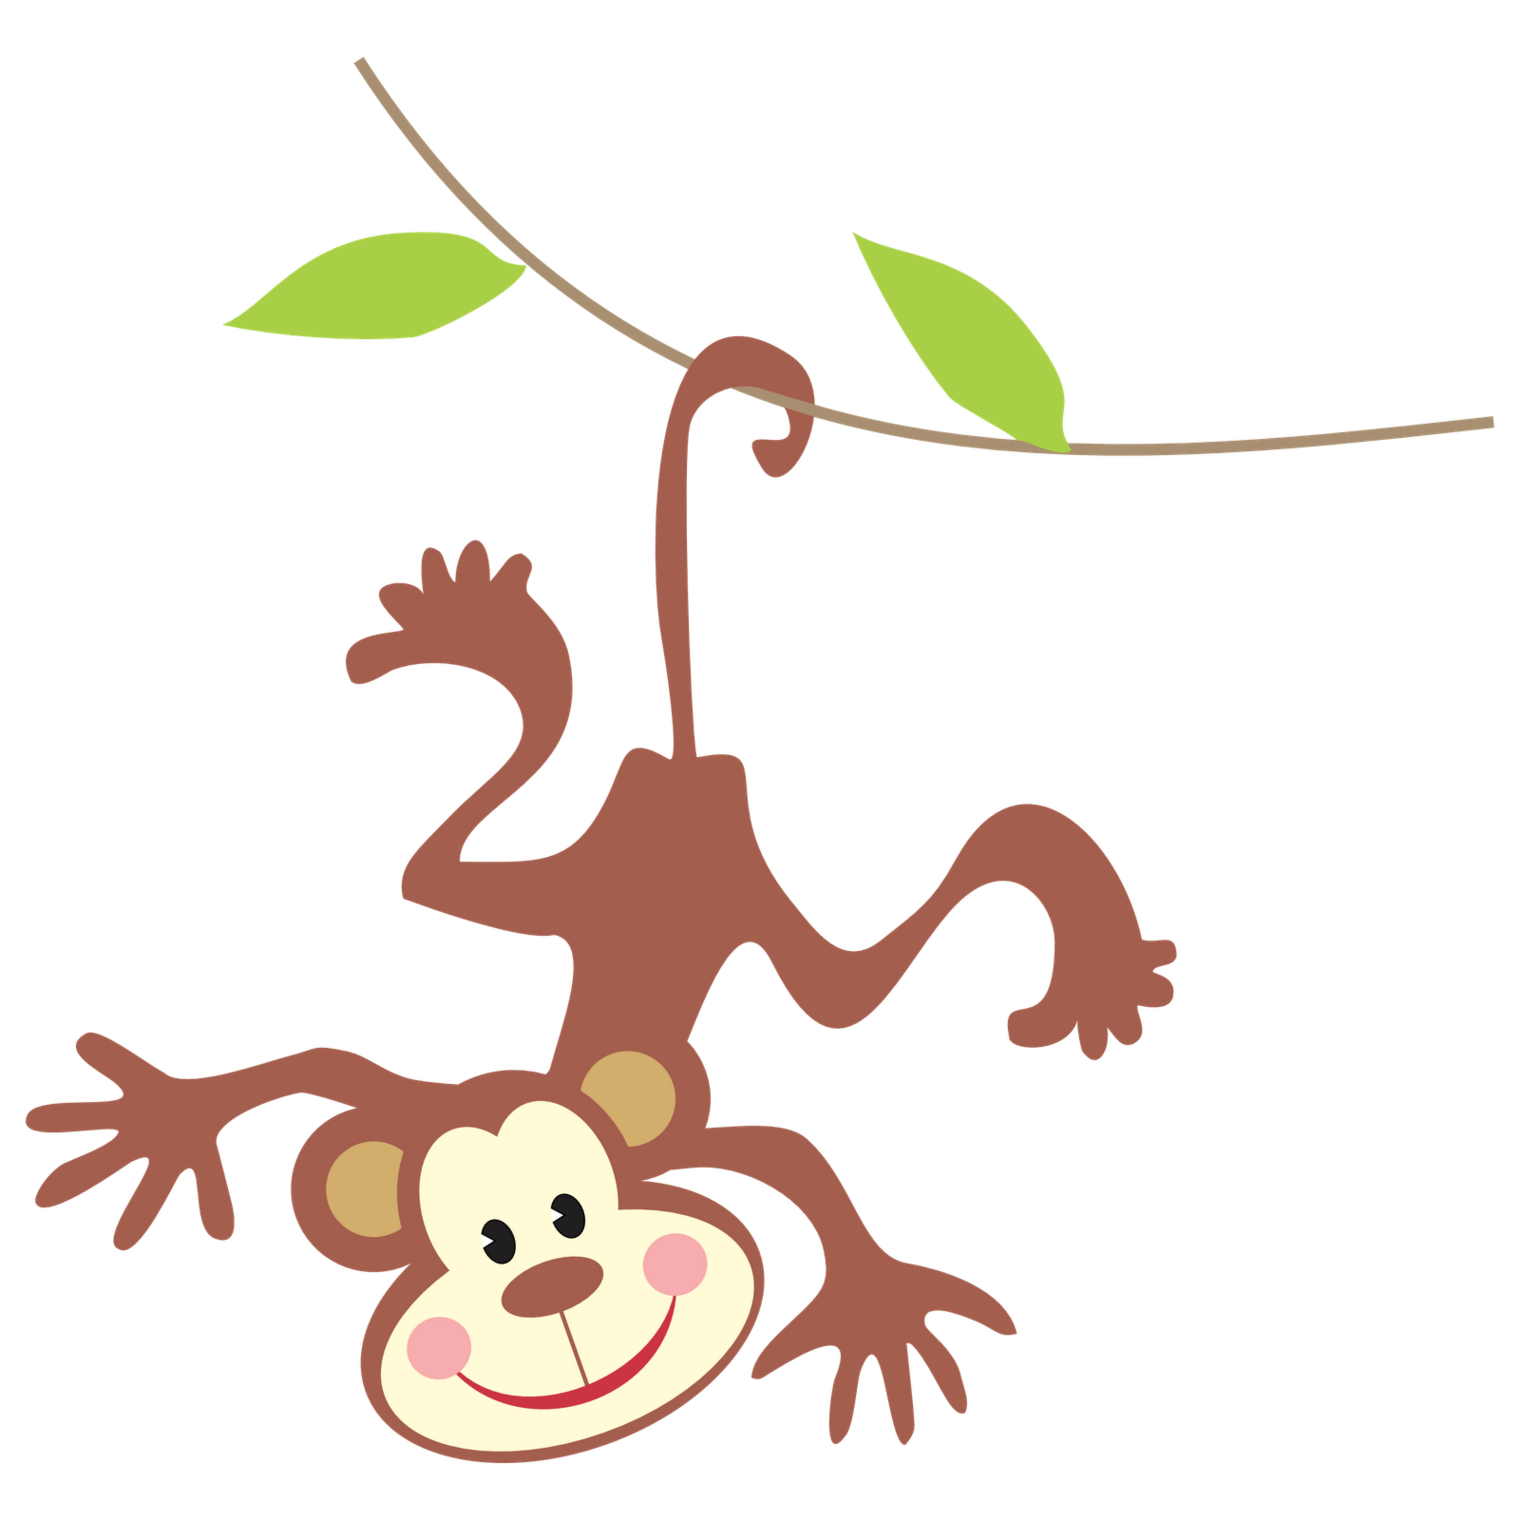 Jungle clipart jungle landscape.  collection of monkey